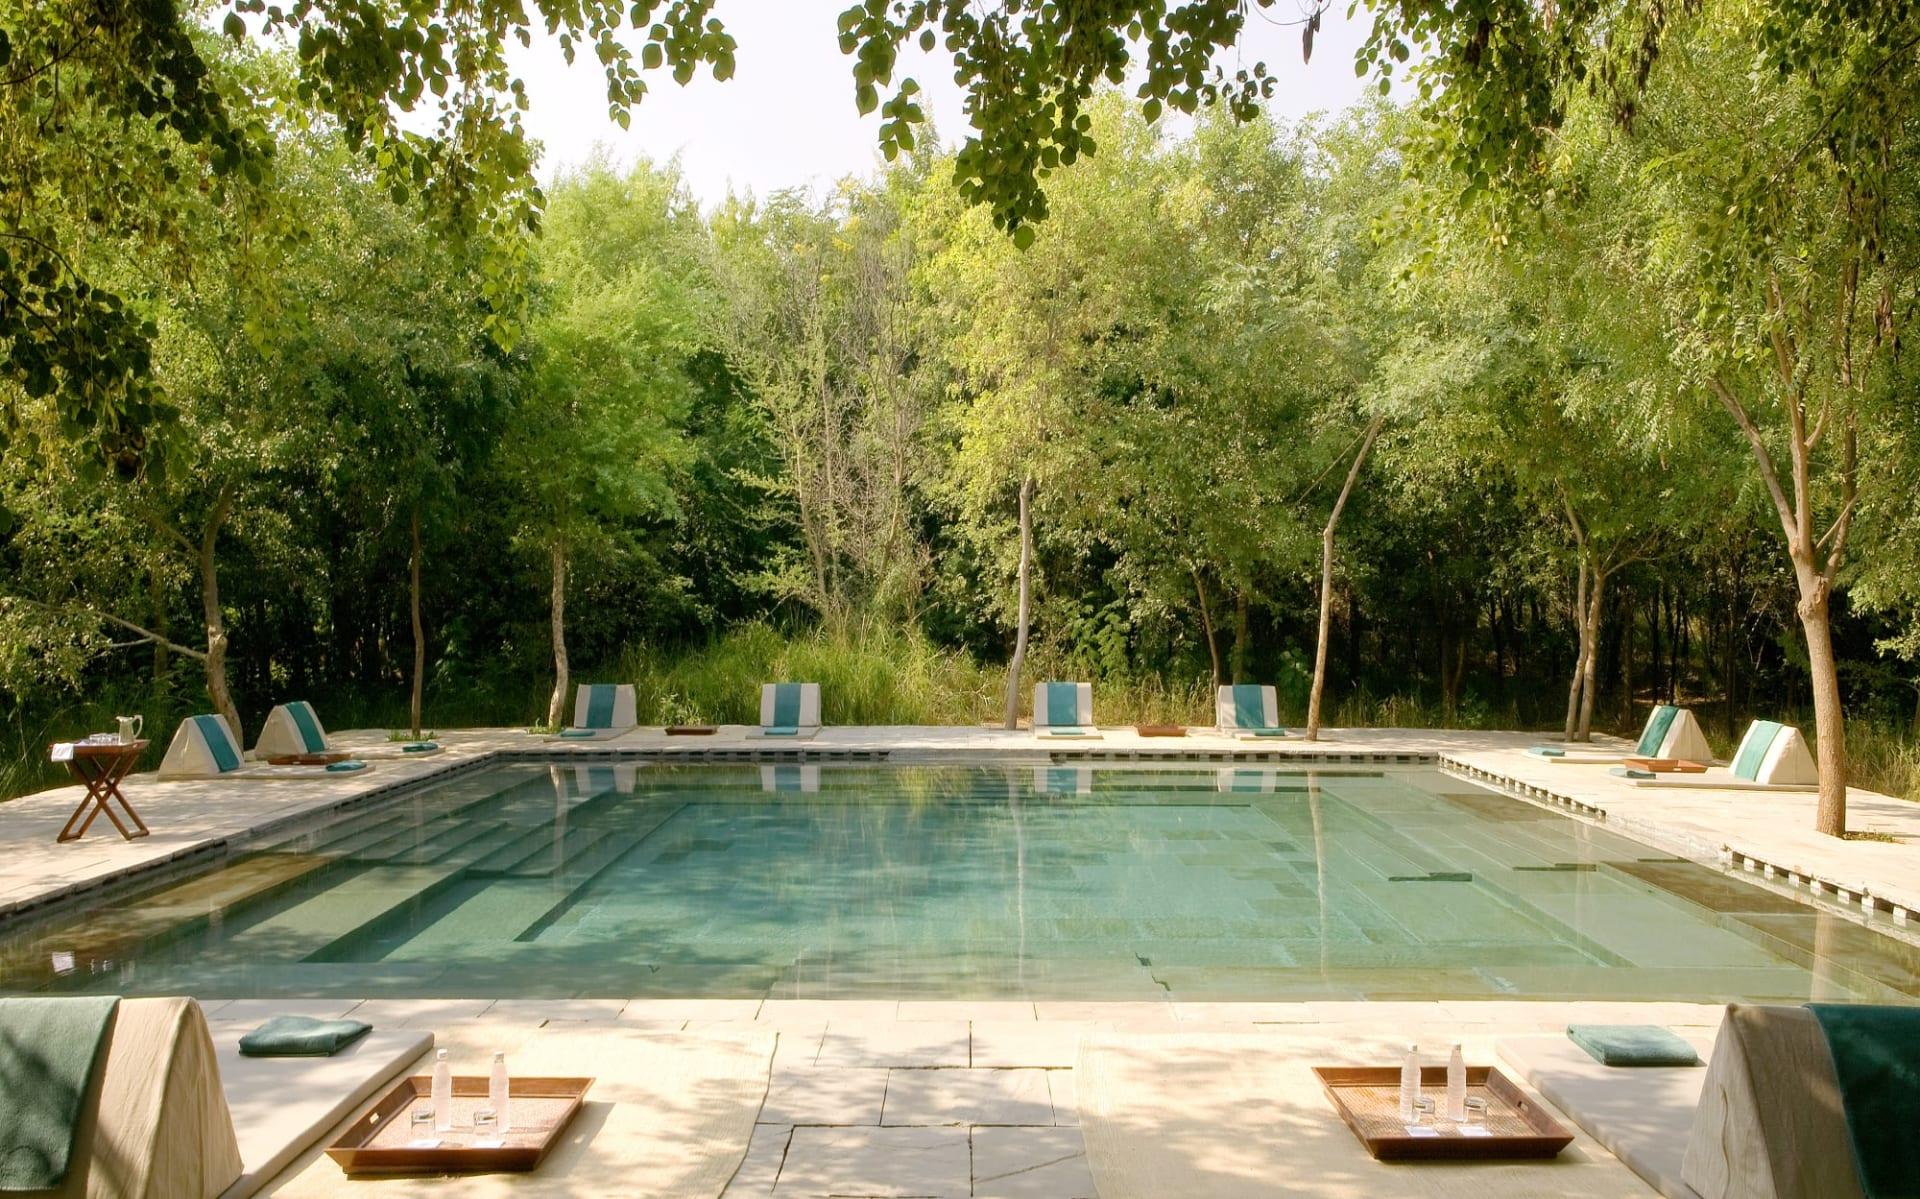 Aman-i-Khas in Ranthambore: Pool